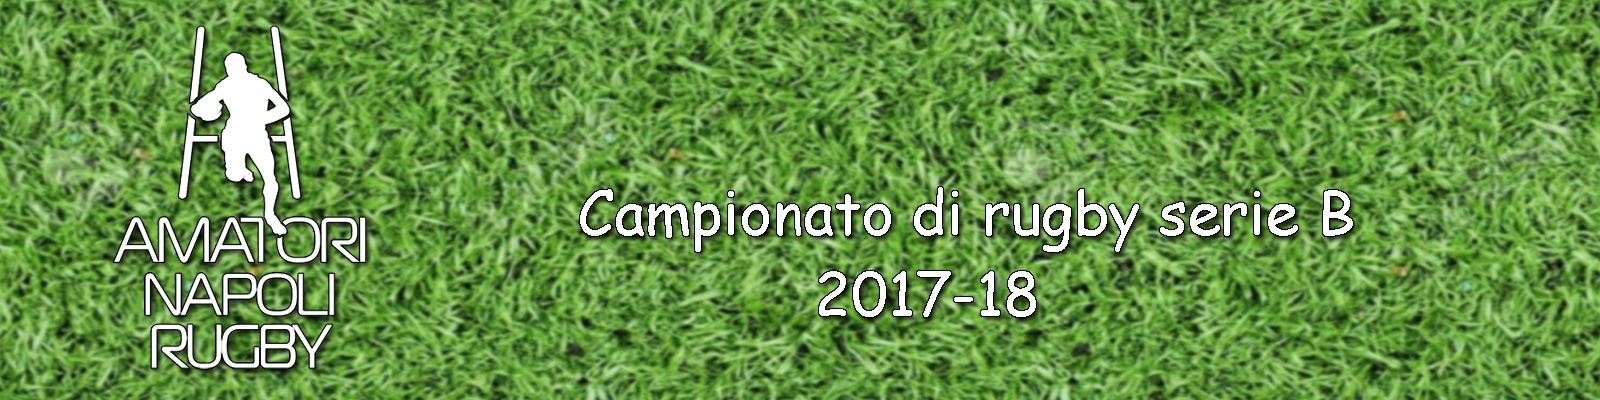 Amatori Napoli Rugby